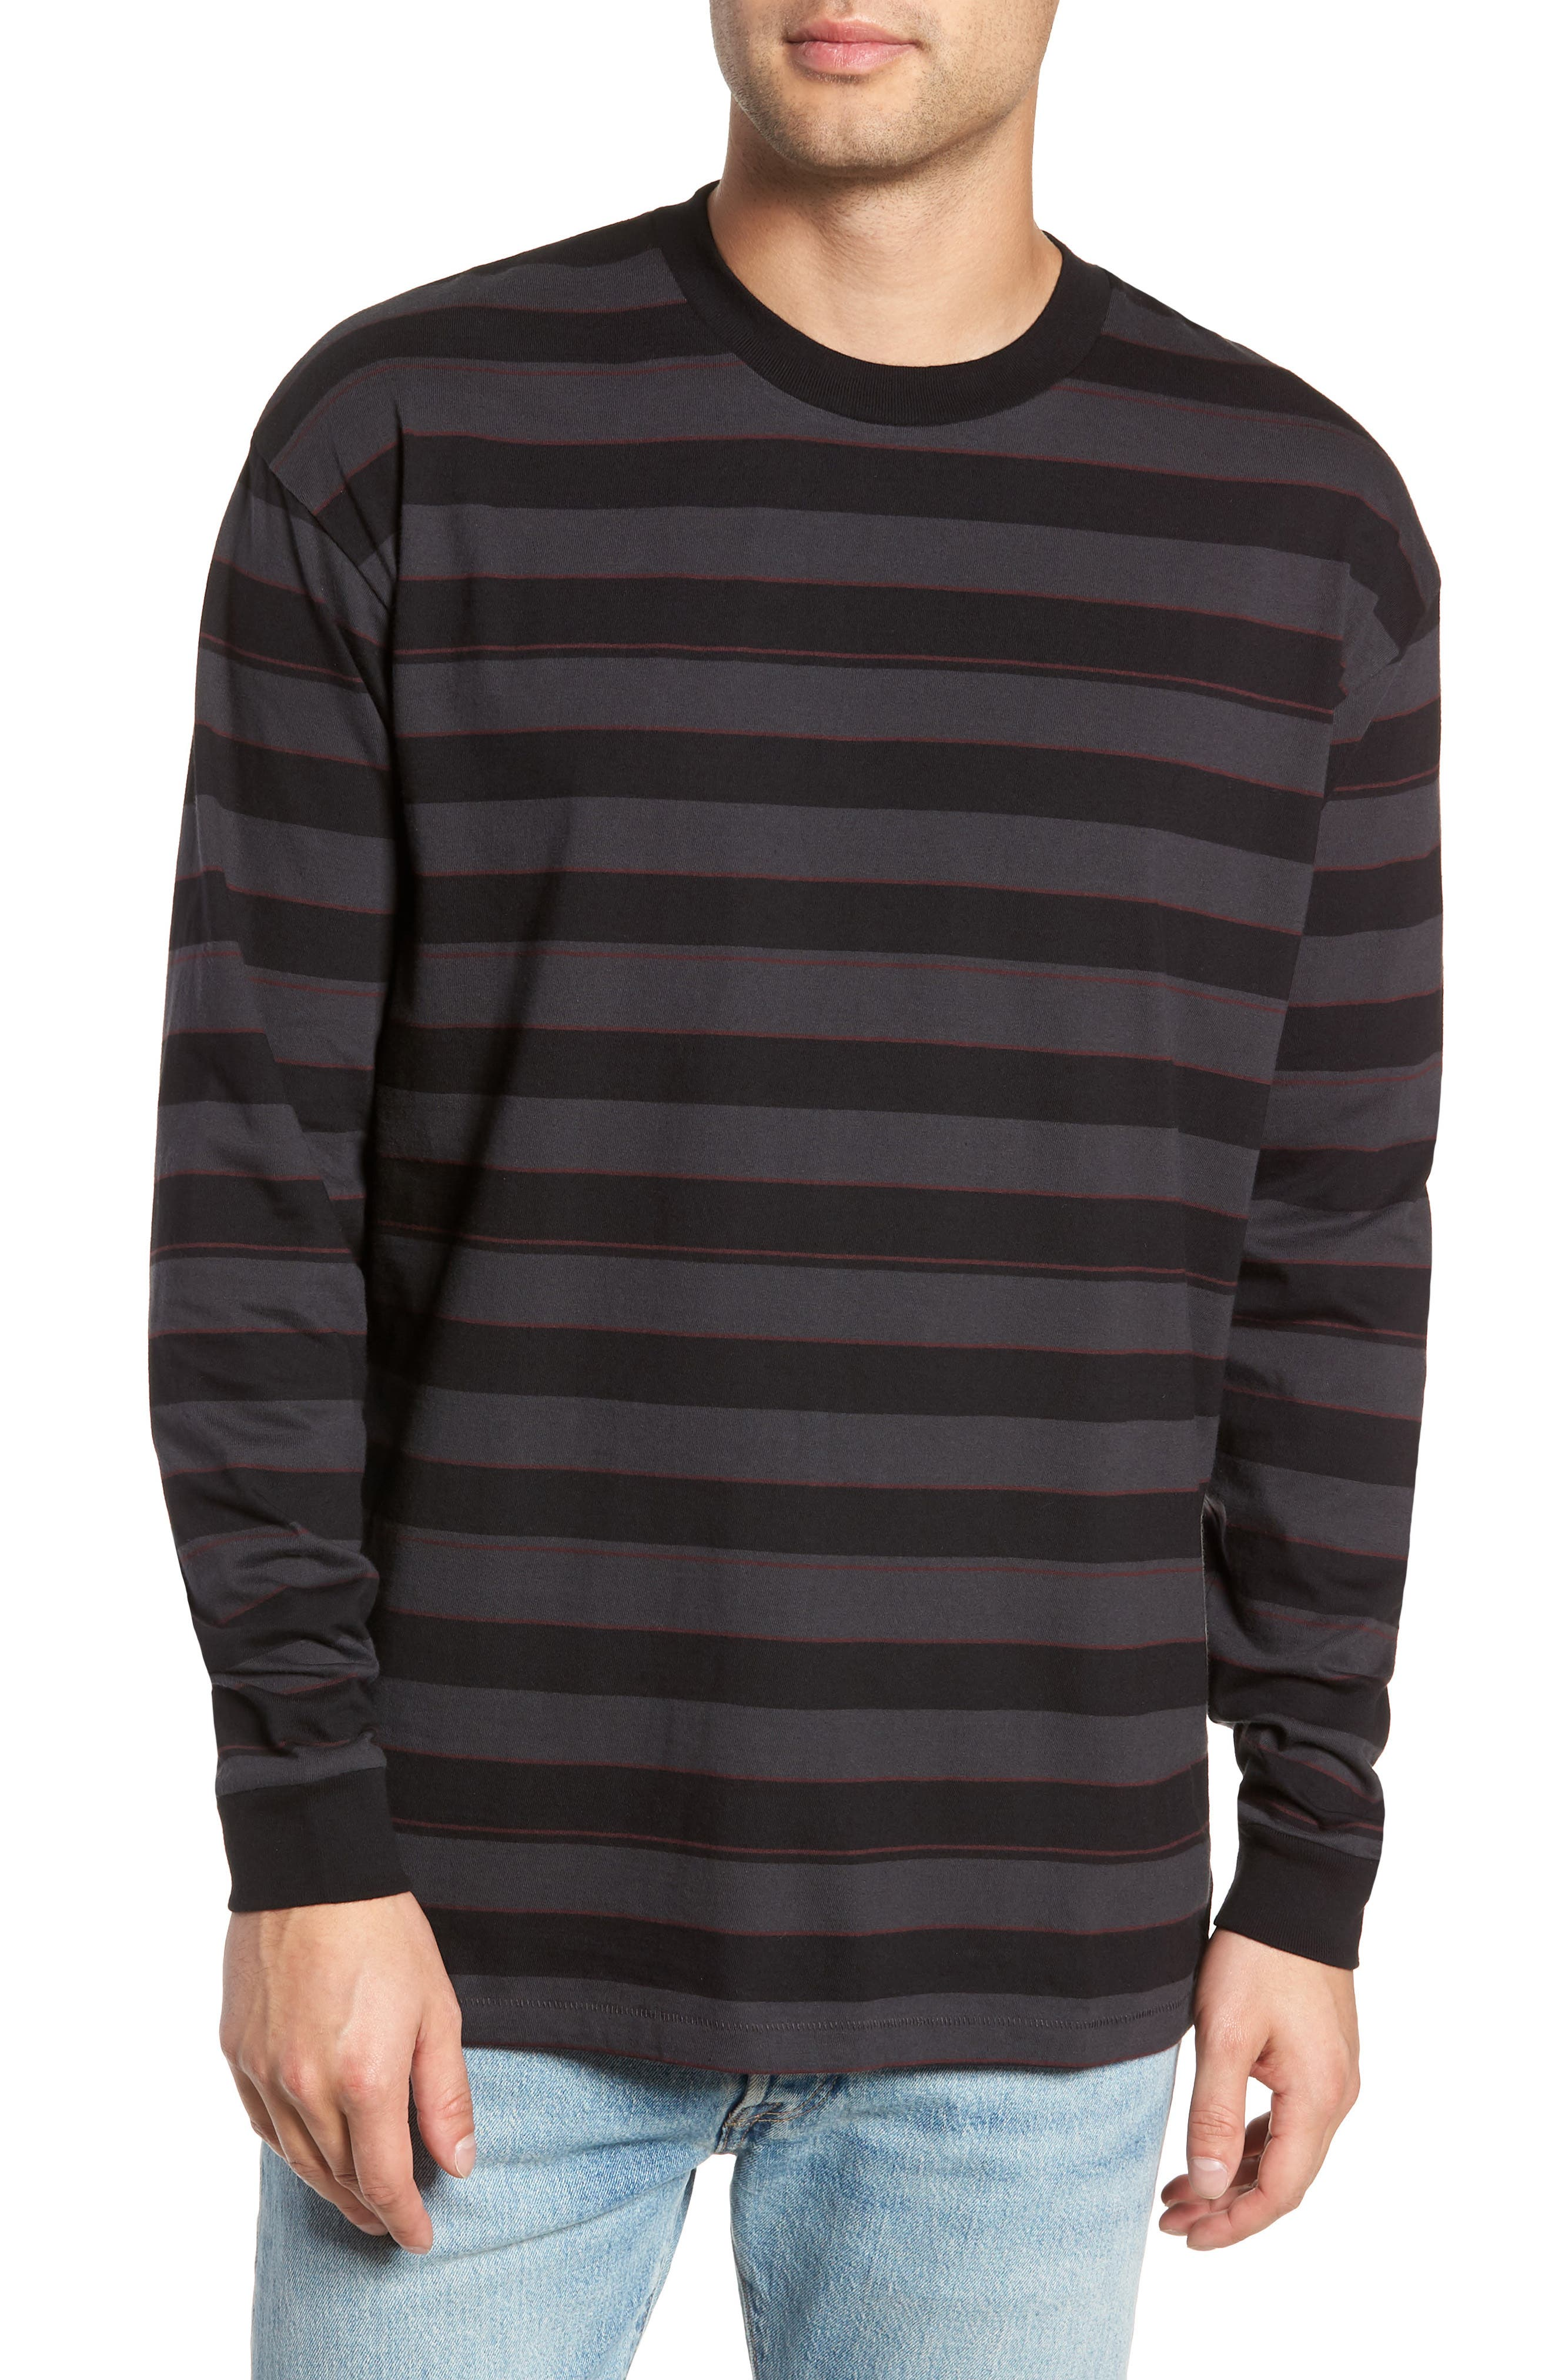 Hoop Box Long Sleeve T-Shirt,                             Main thumbnail 1, color,                             VINTAGE BLACK/ BLACK